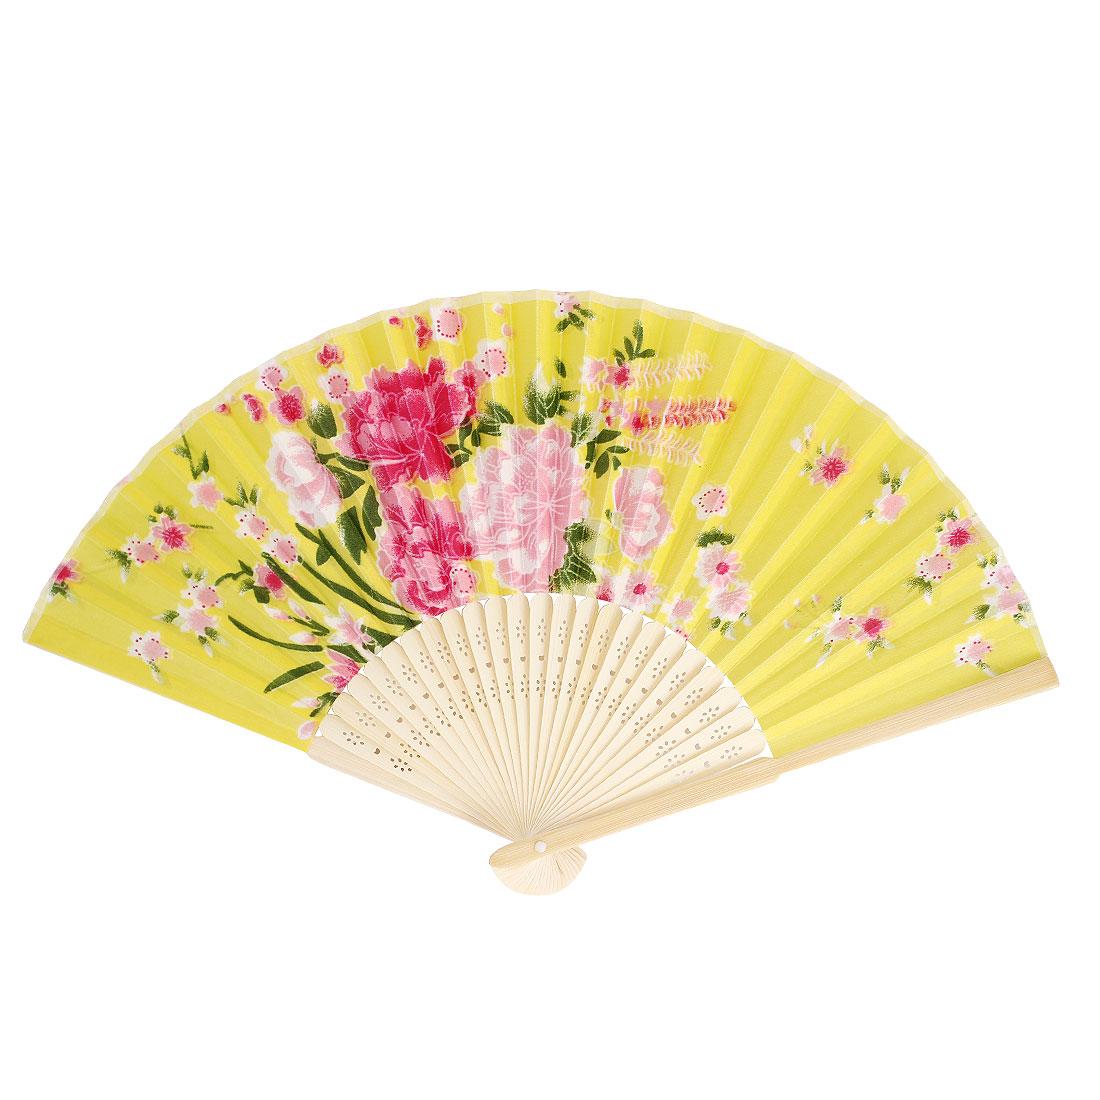 Multicolors Flowers Print Bamboo Ribs Foldable Mini Hand Fan Yellow